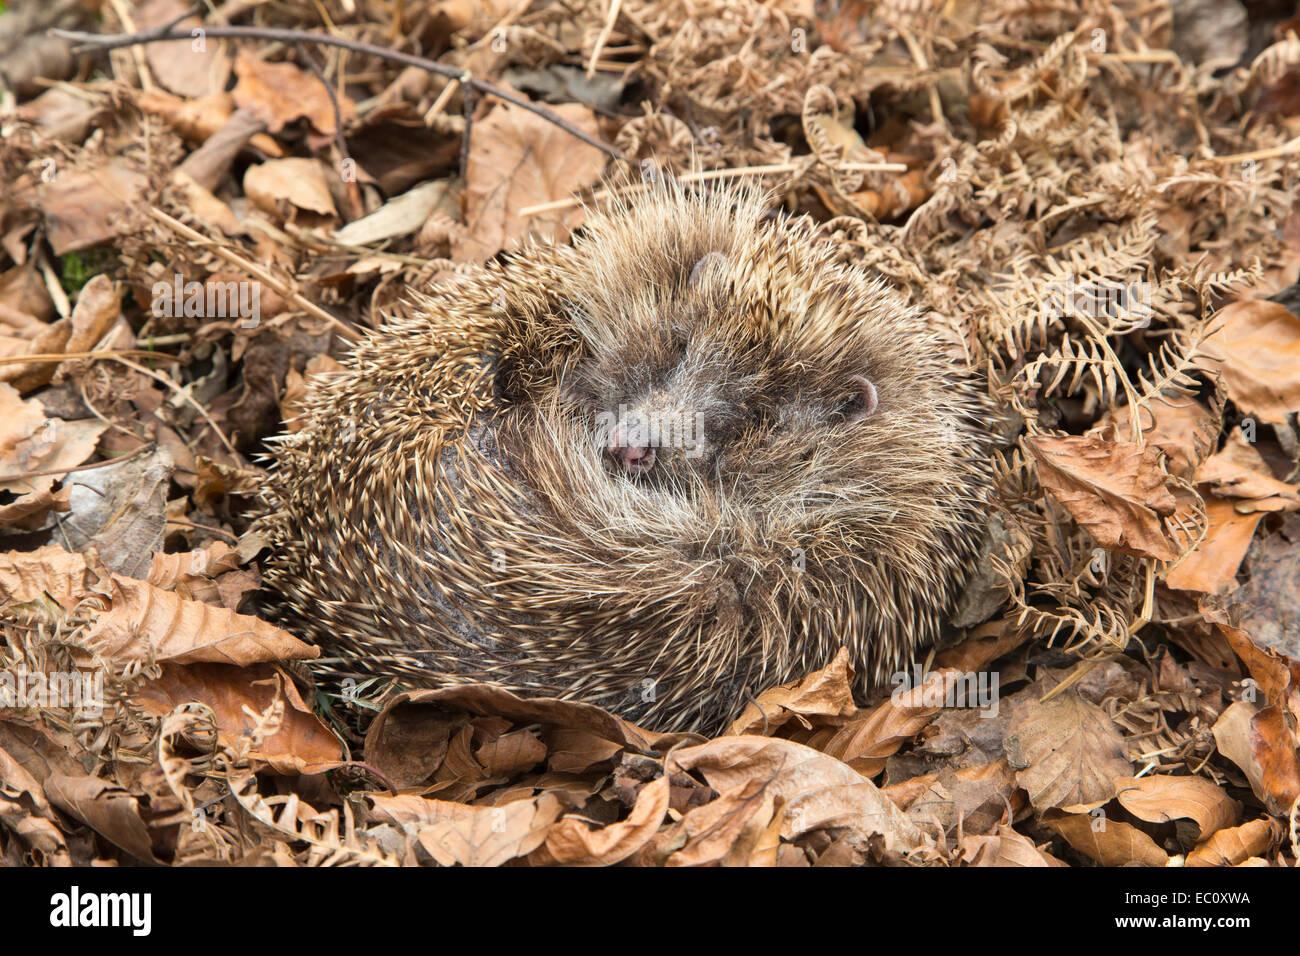 Hedgehog (Erinaceus europaeus) sleeping in autumn leaves, captive, UK Stock Photo